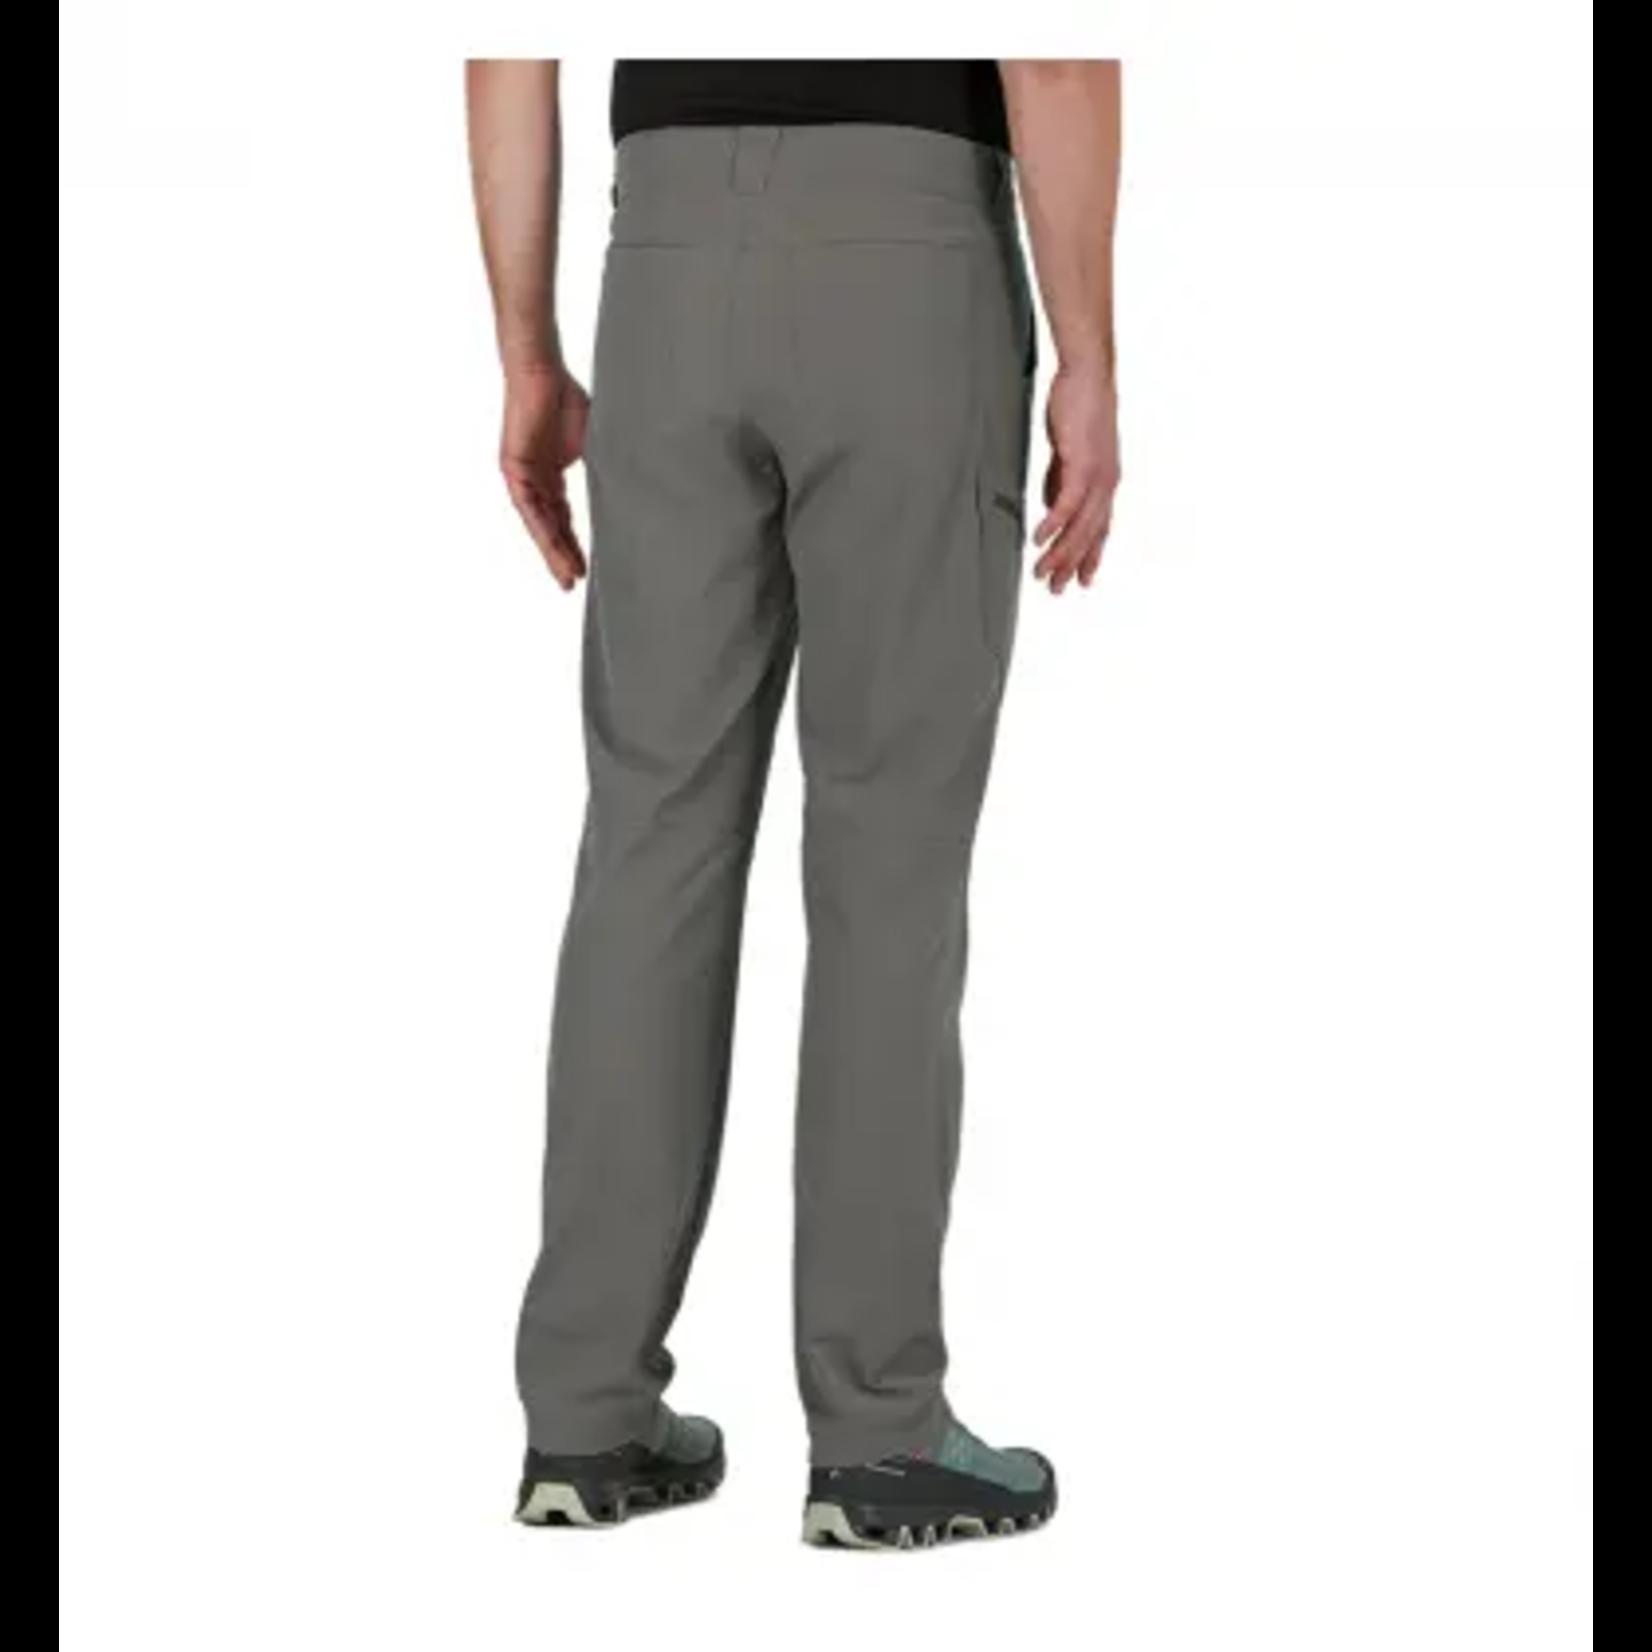 "OR Outdoor Research Men's Ferrosi Pants 30"" Insem"